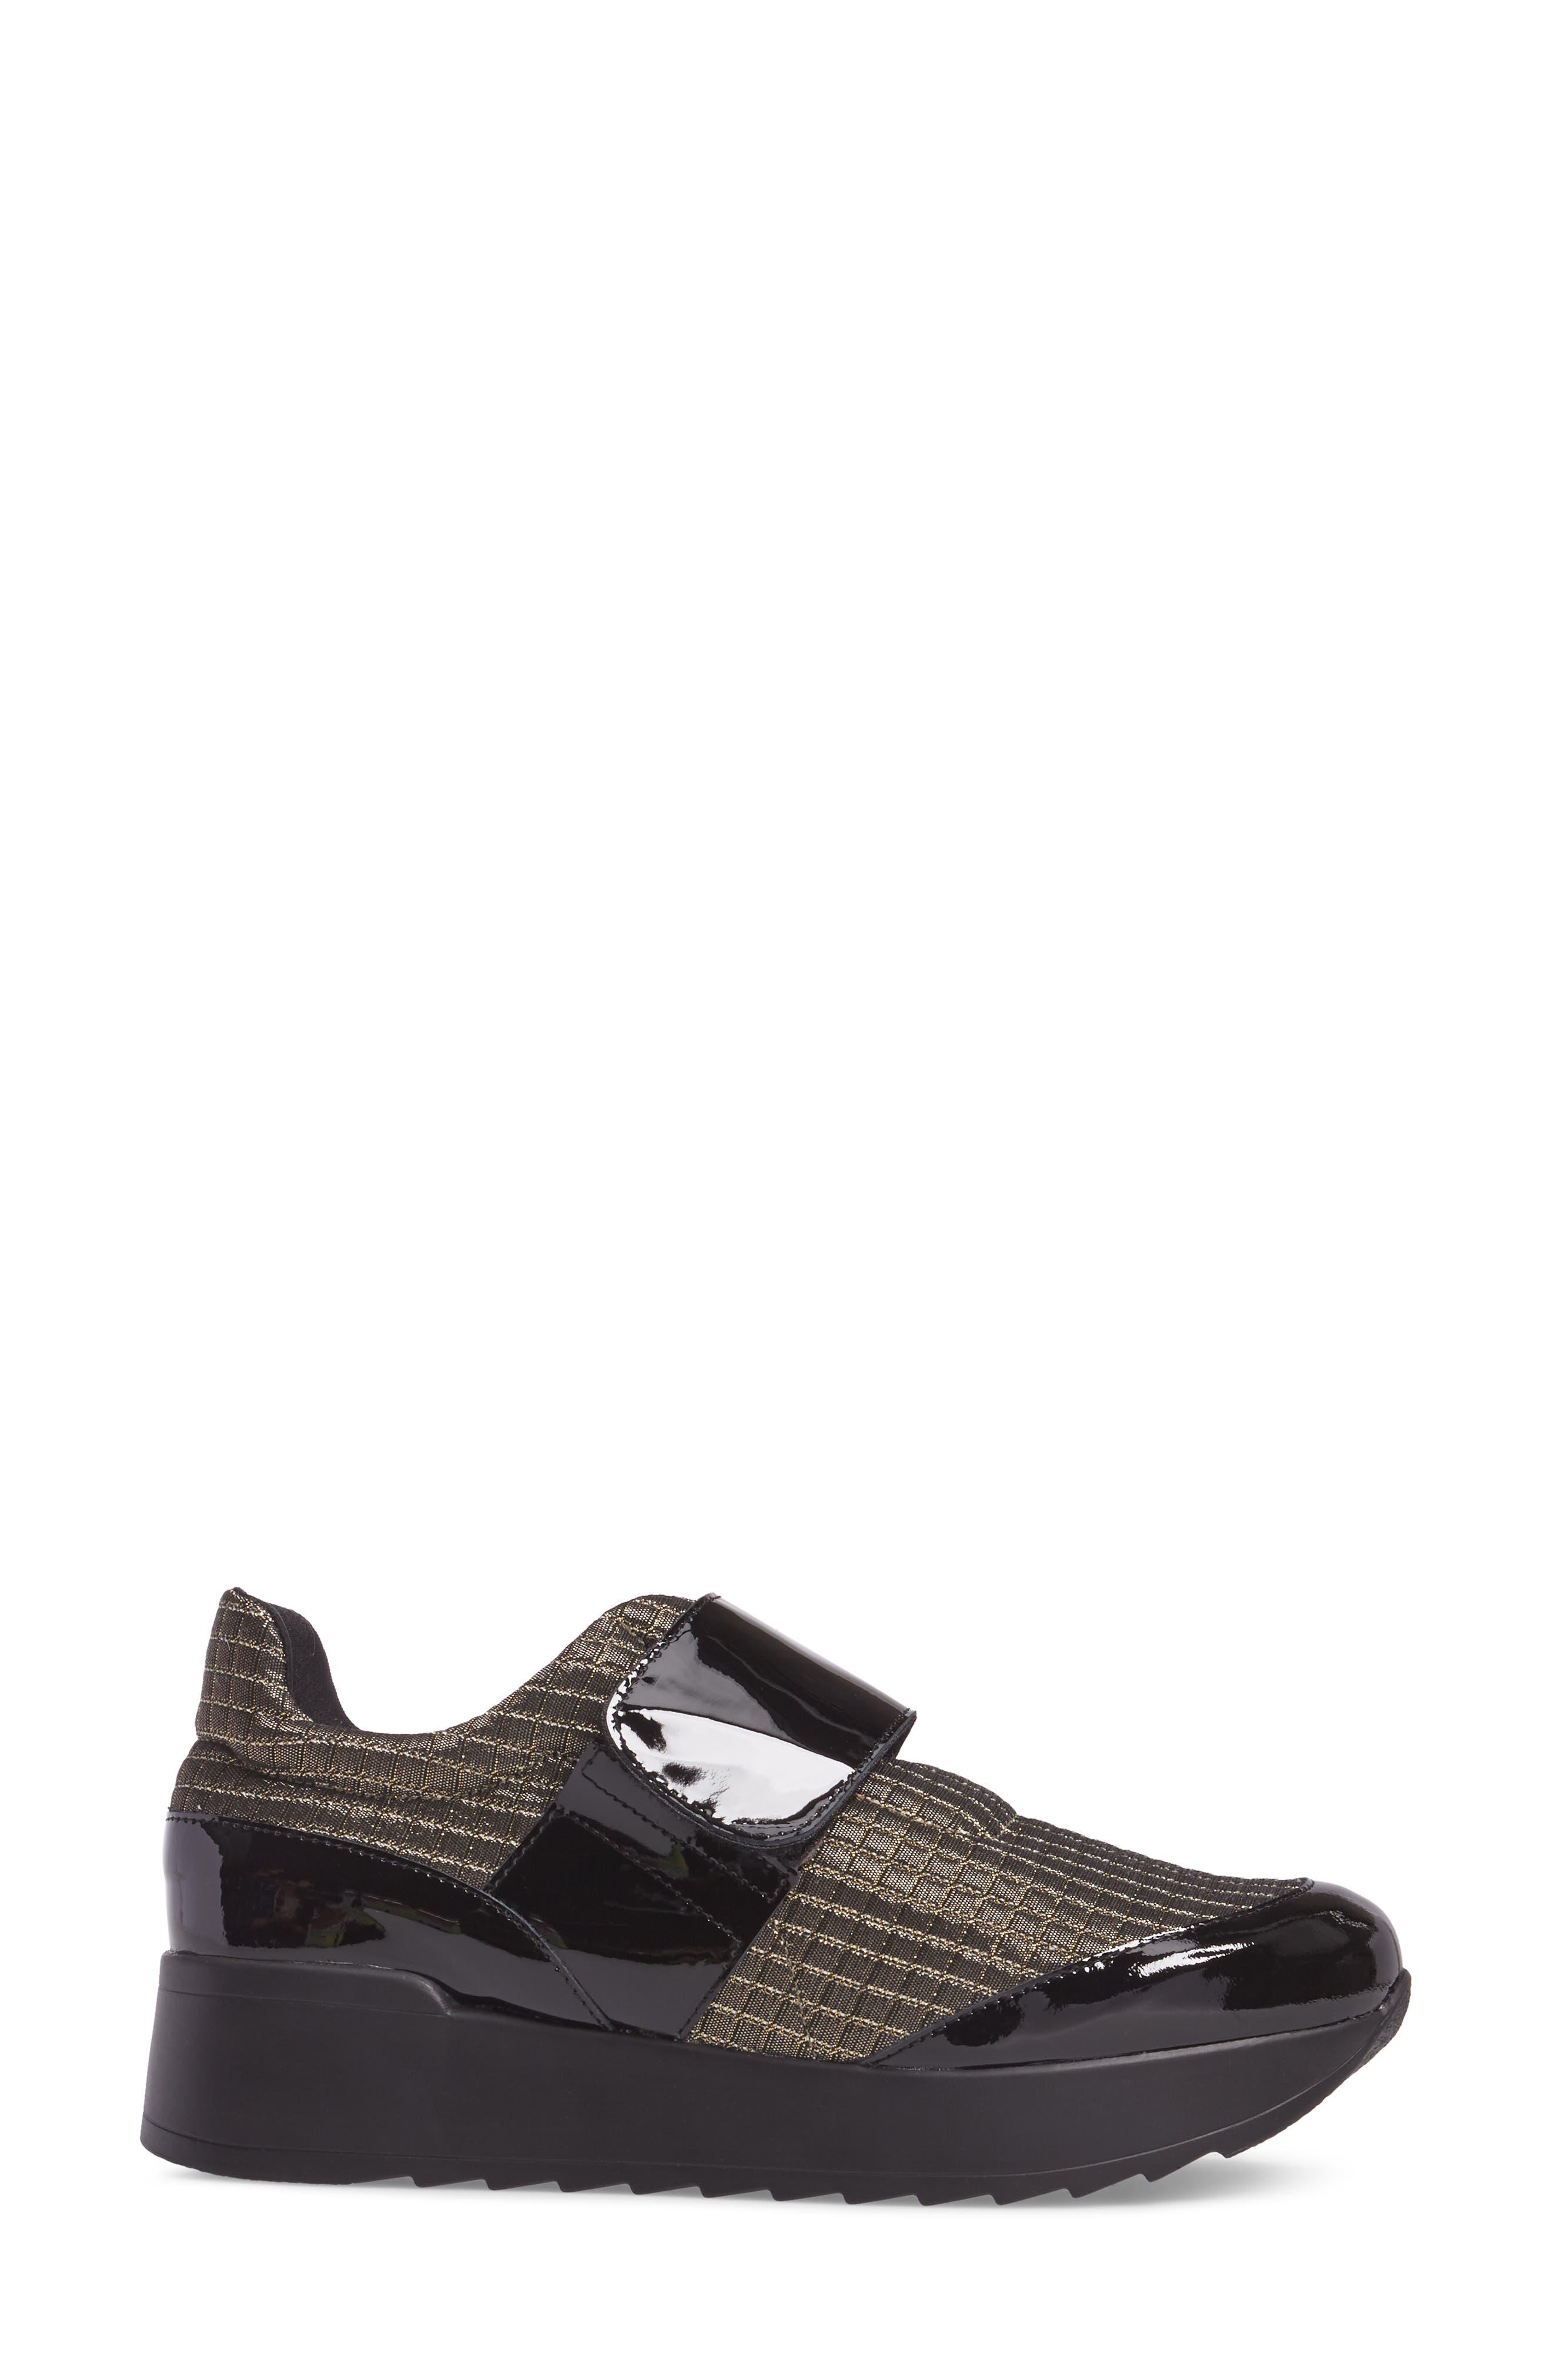 Cannon Sneaker,                             Alternate thumbnail 3, color,                             001